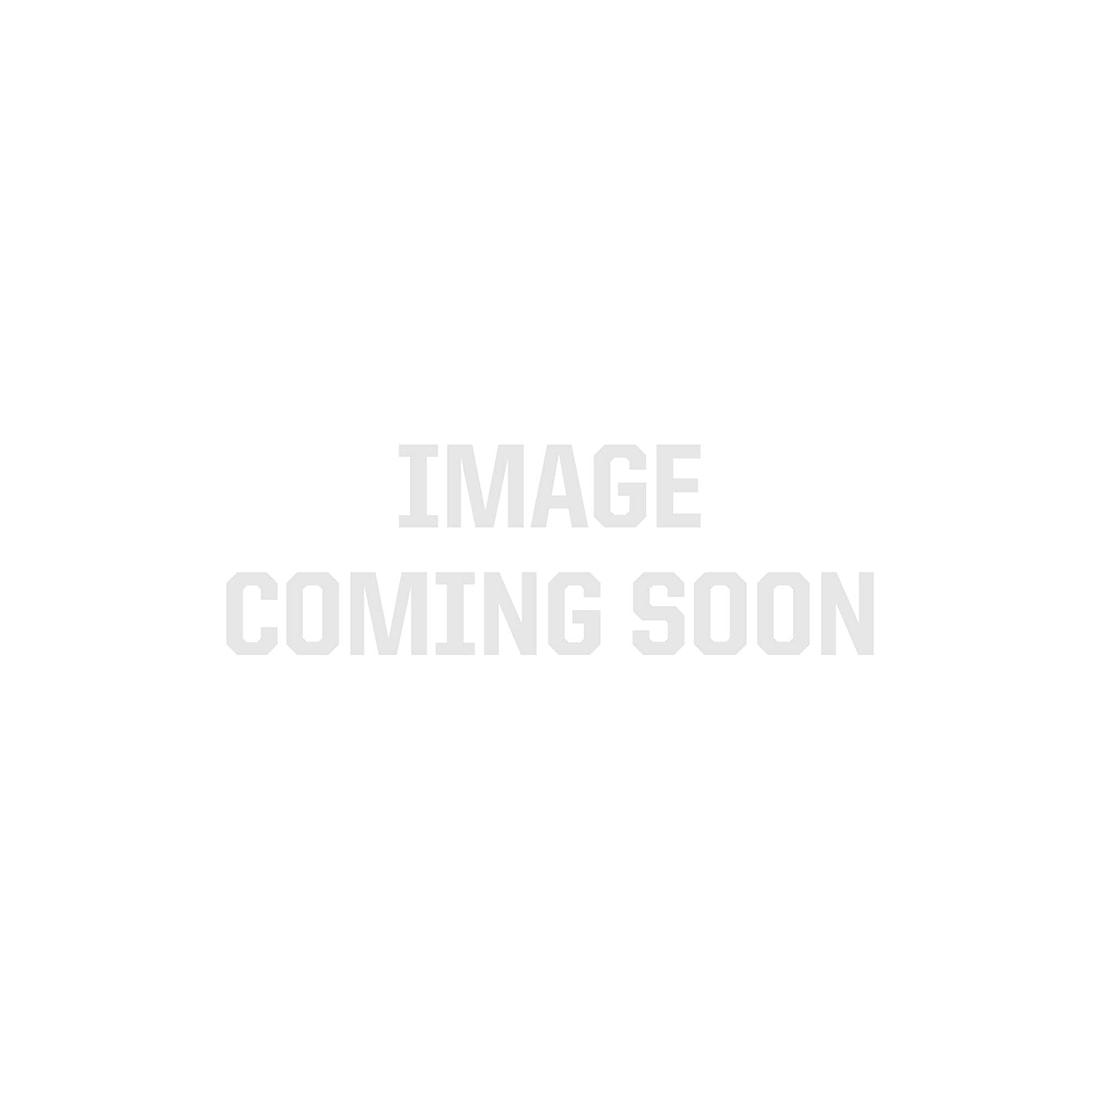 Daylight White 2835 Single Row CurrentControl LED Strip Light, 60/m, 10mm wide, Sample Kit